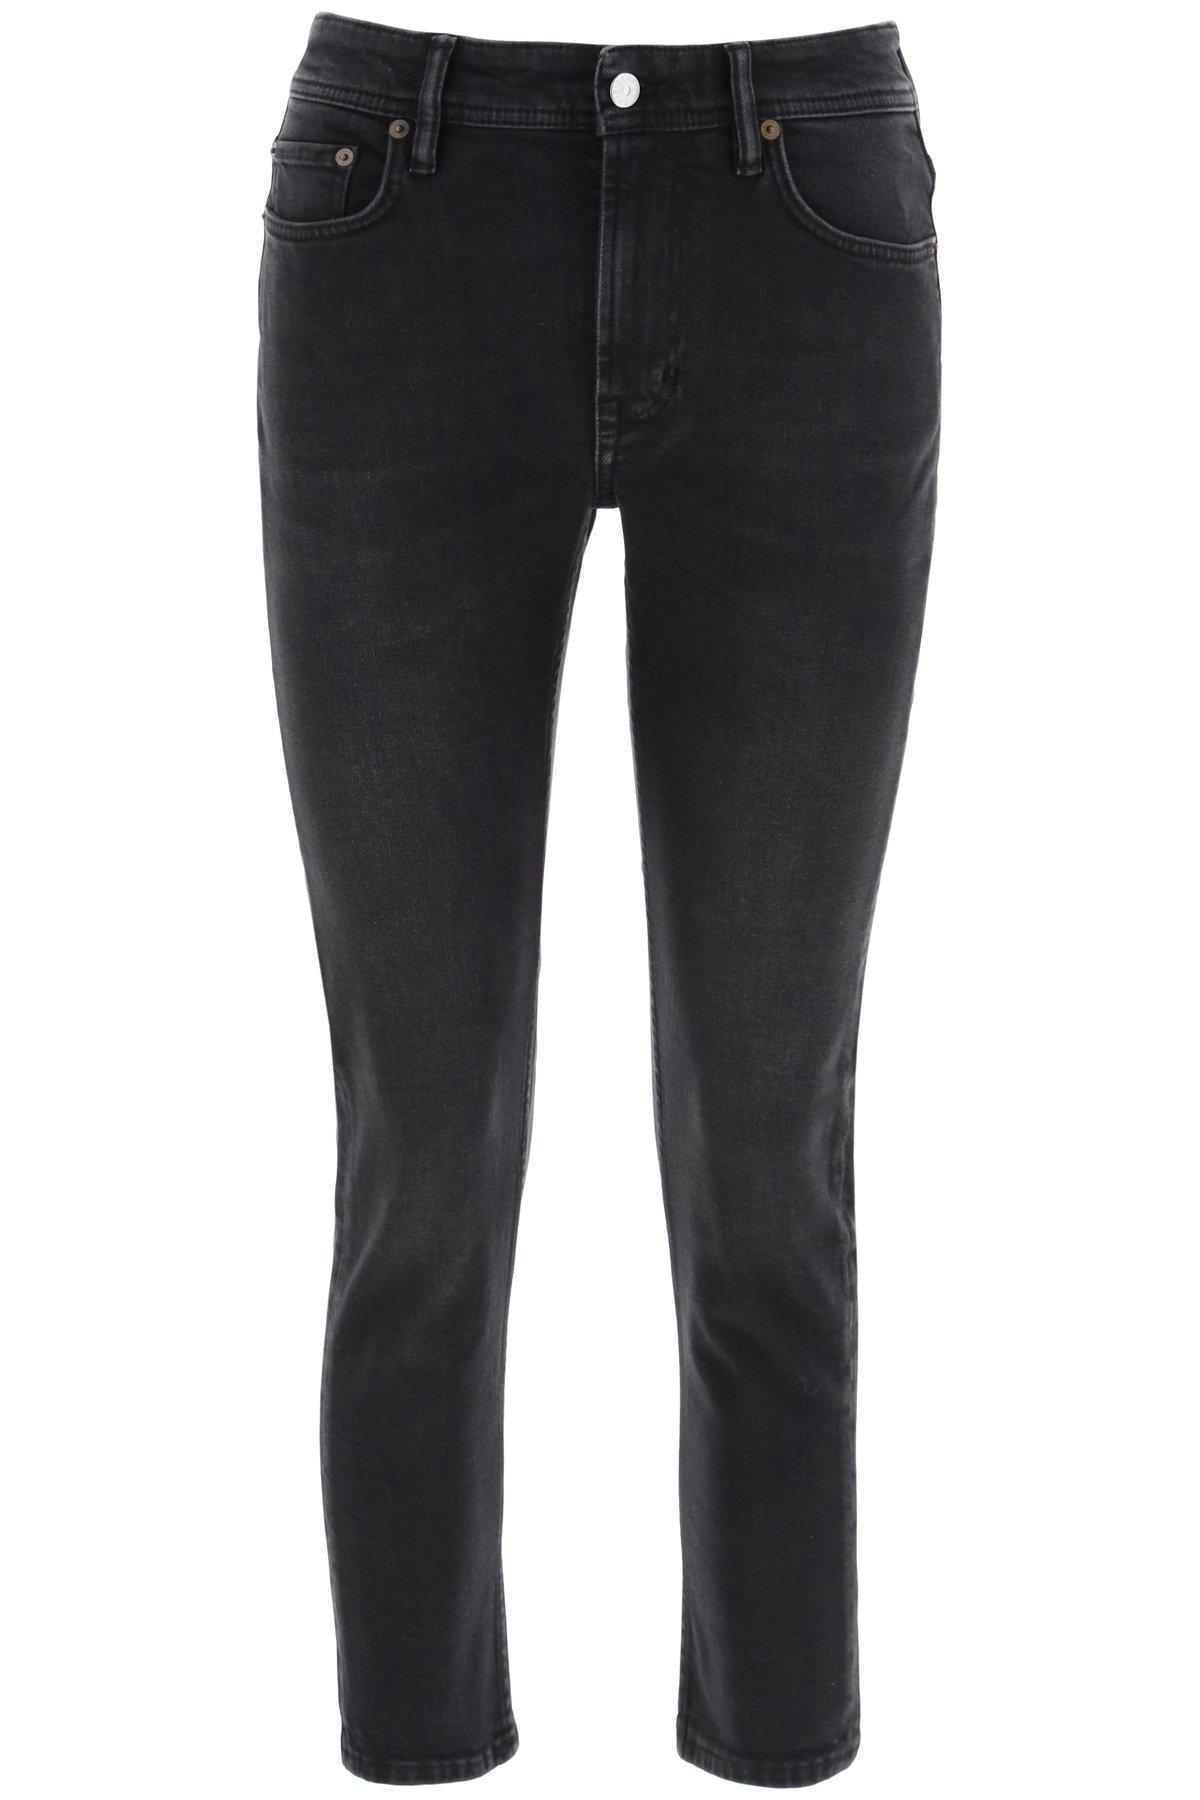 Acne studios melk cropped jeans